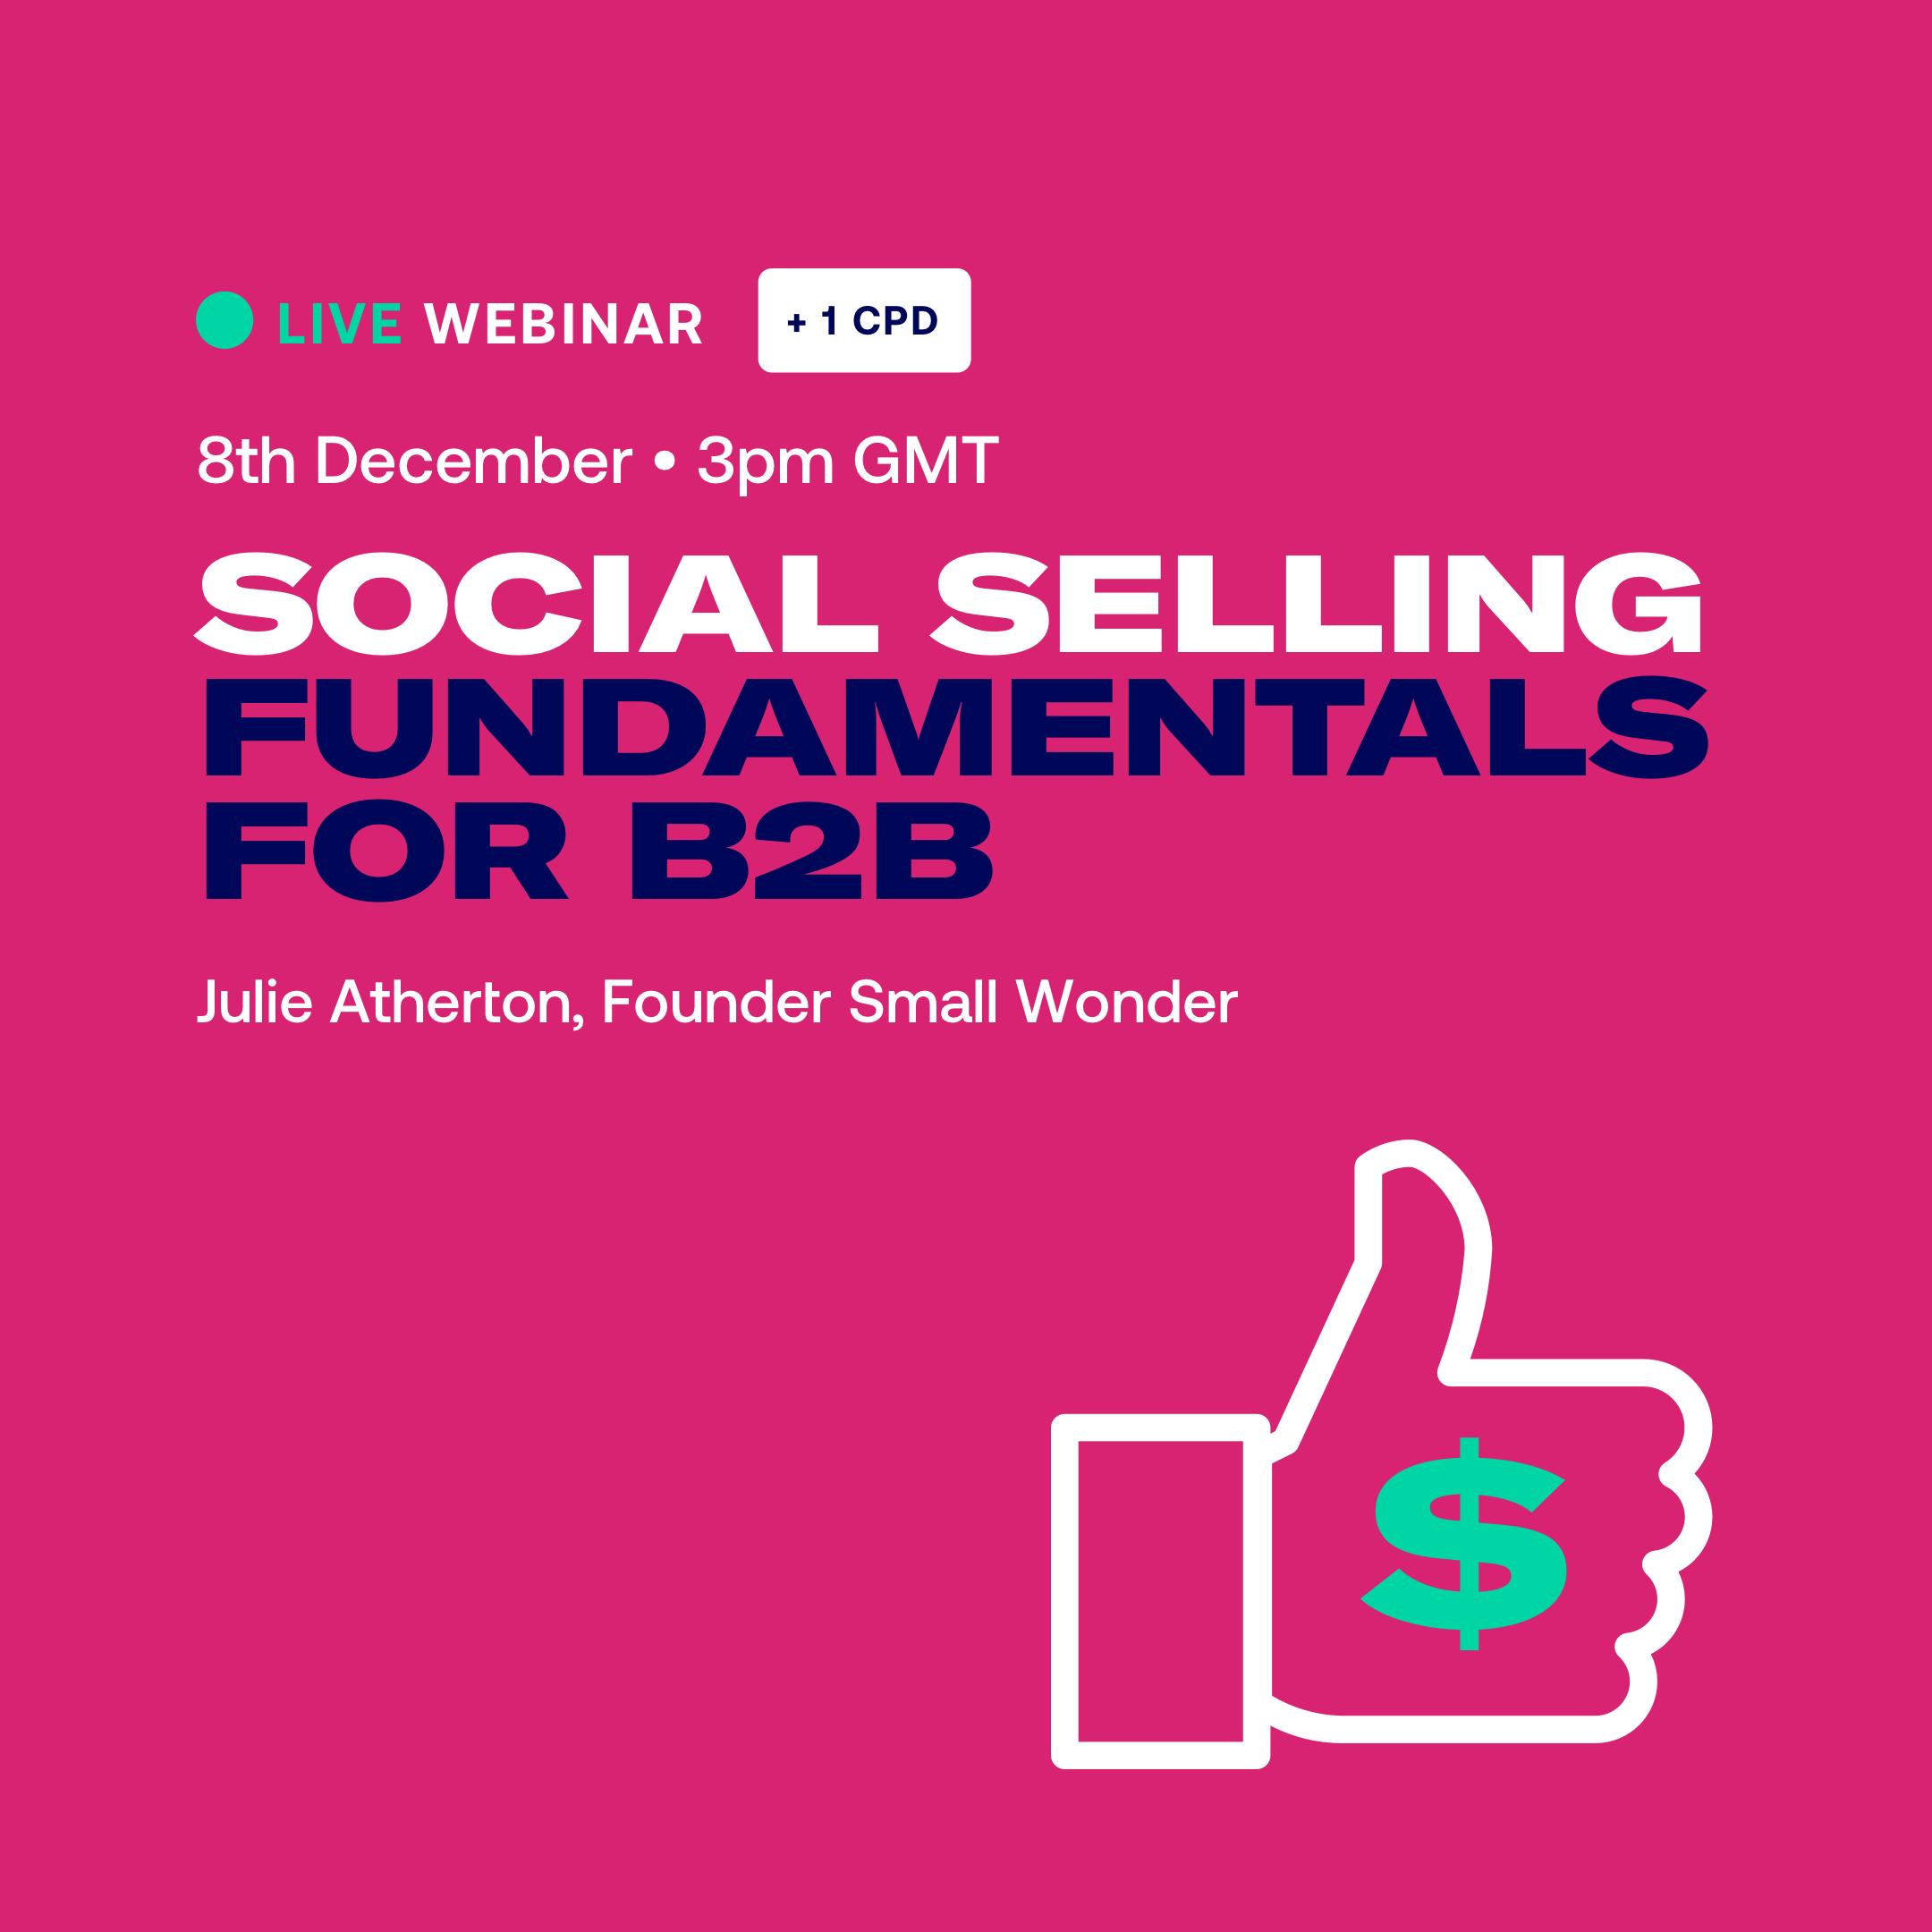 Social Selling Fundamentals for B2B_Social Insta-V2.png